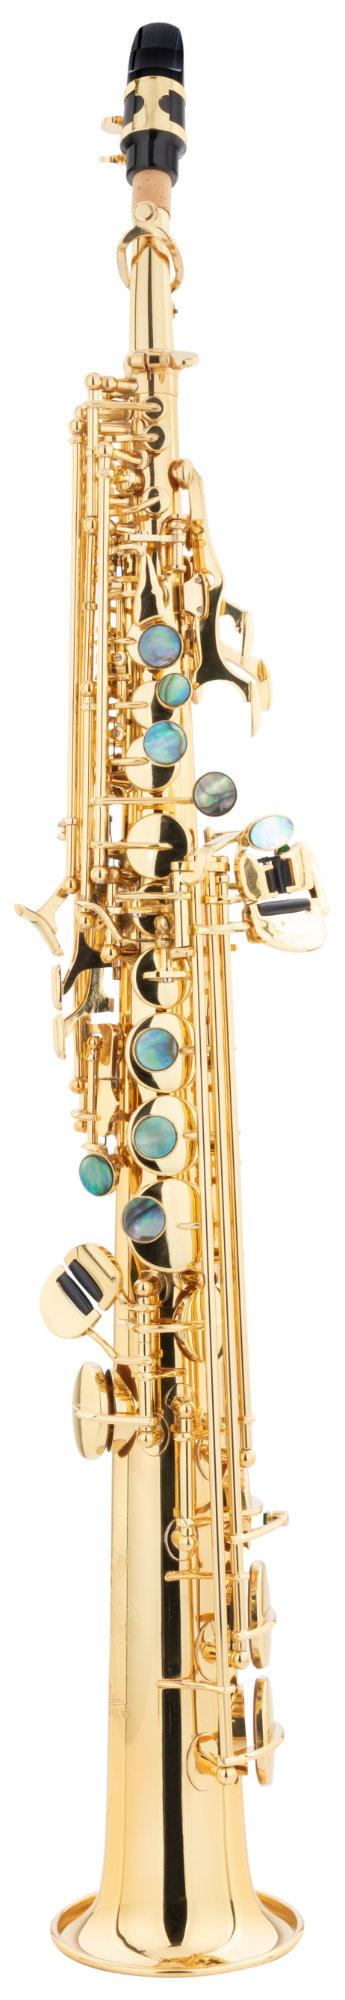 Saxophone - Lechgold LSS 20L Sopran Saxophon lackiert - Onlineshop Musikhaus Kirstein